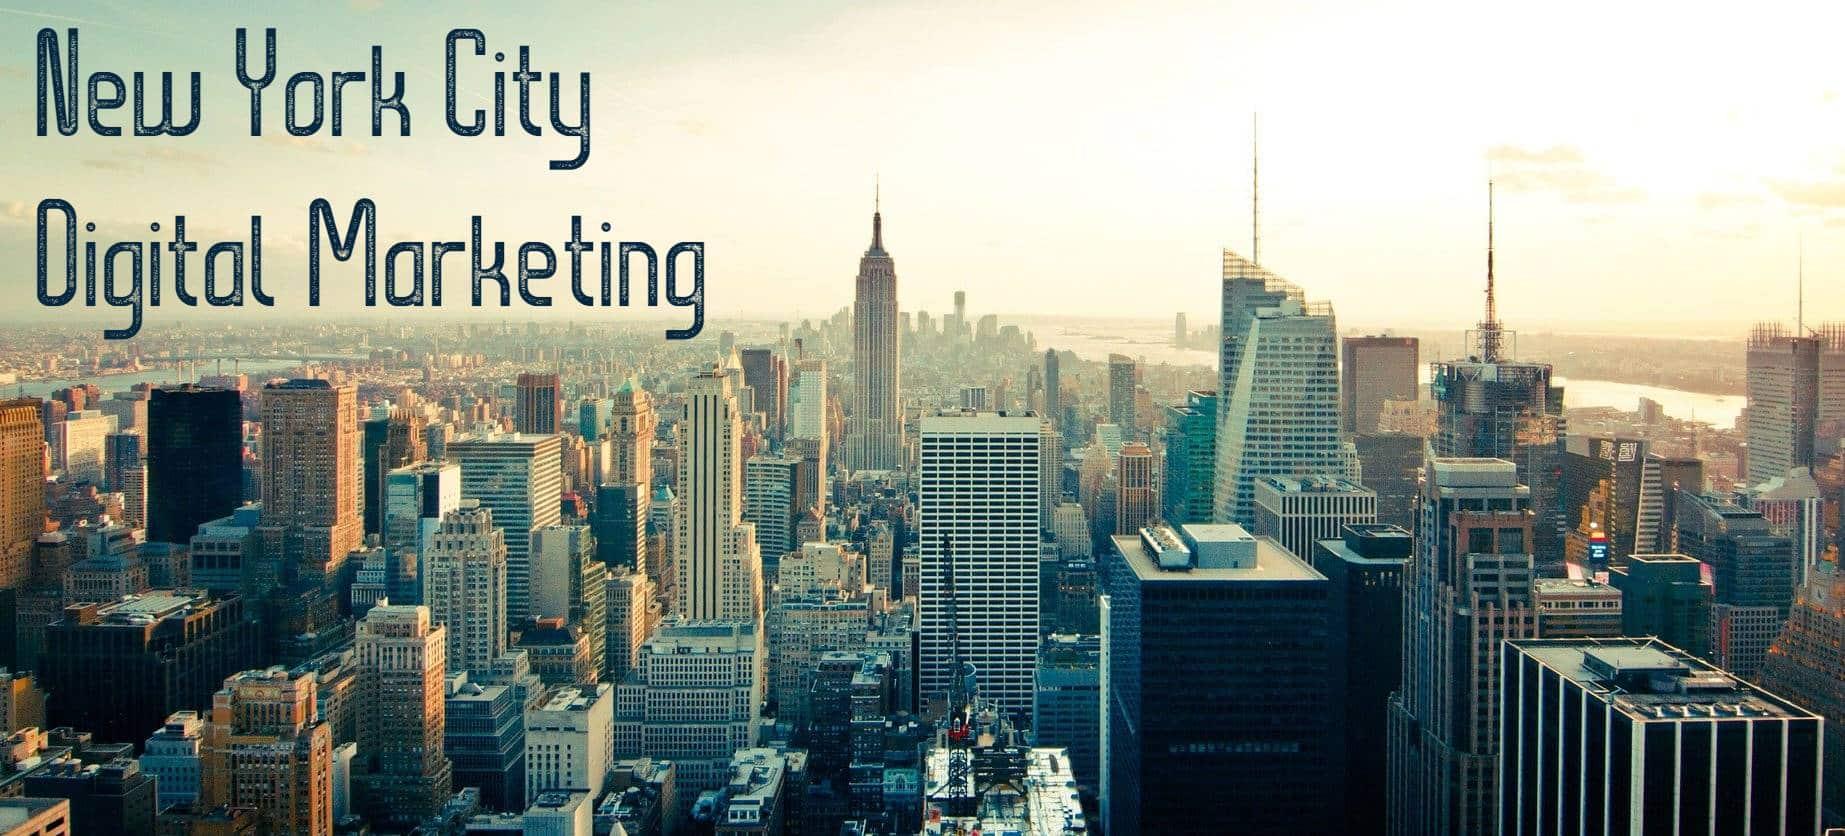 Digital marketing in New York City